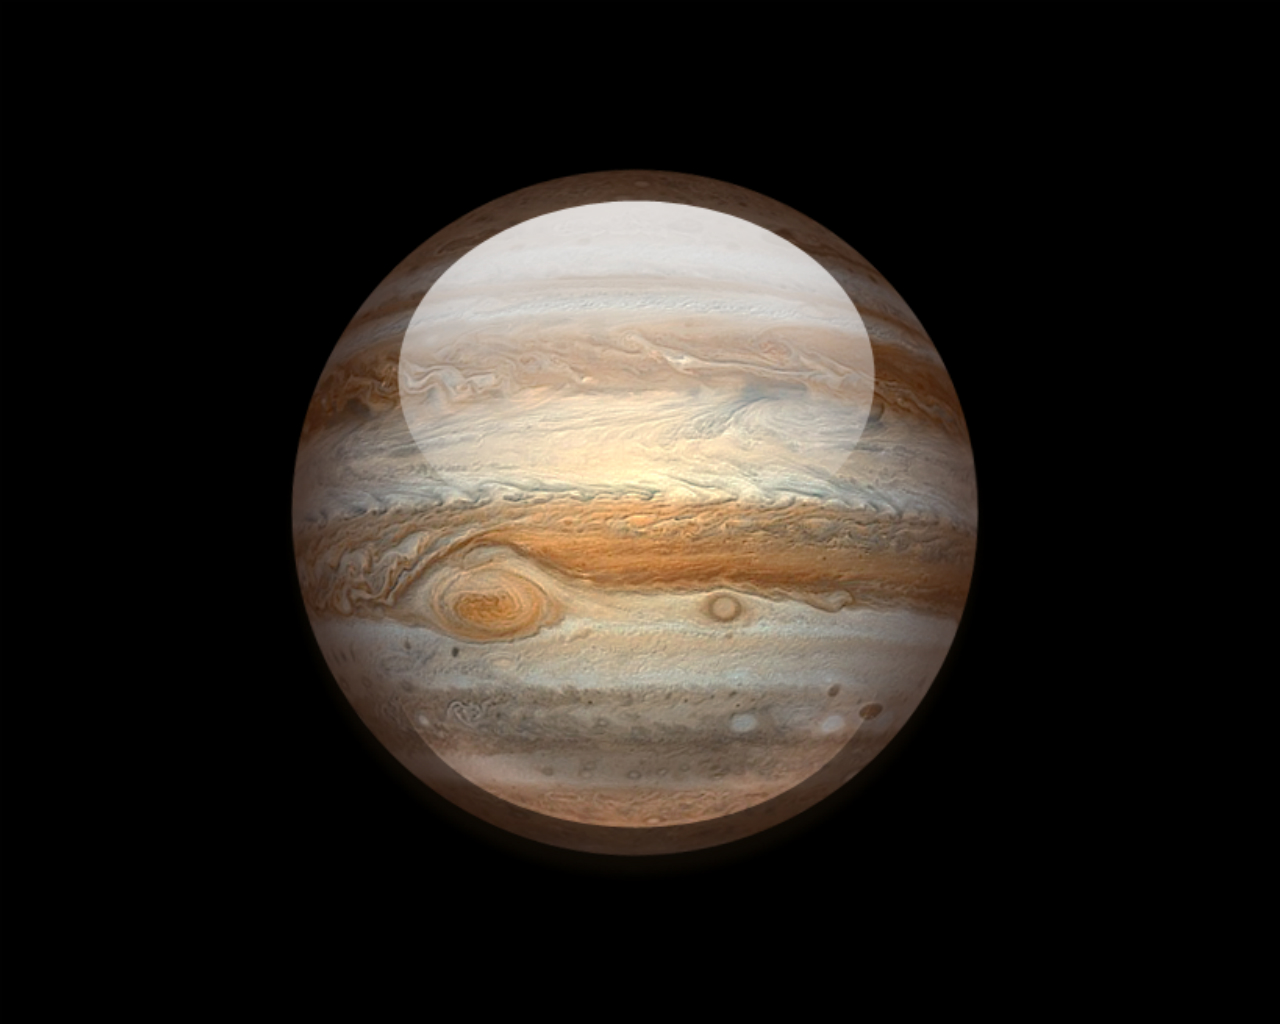 Jupiter wallpaper wallpapersafari - Jupiter wallpaper ...